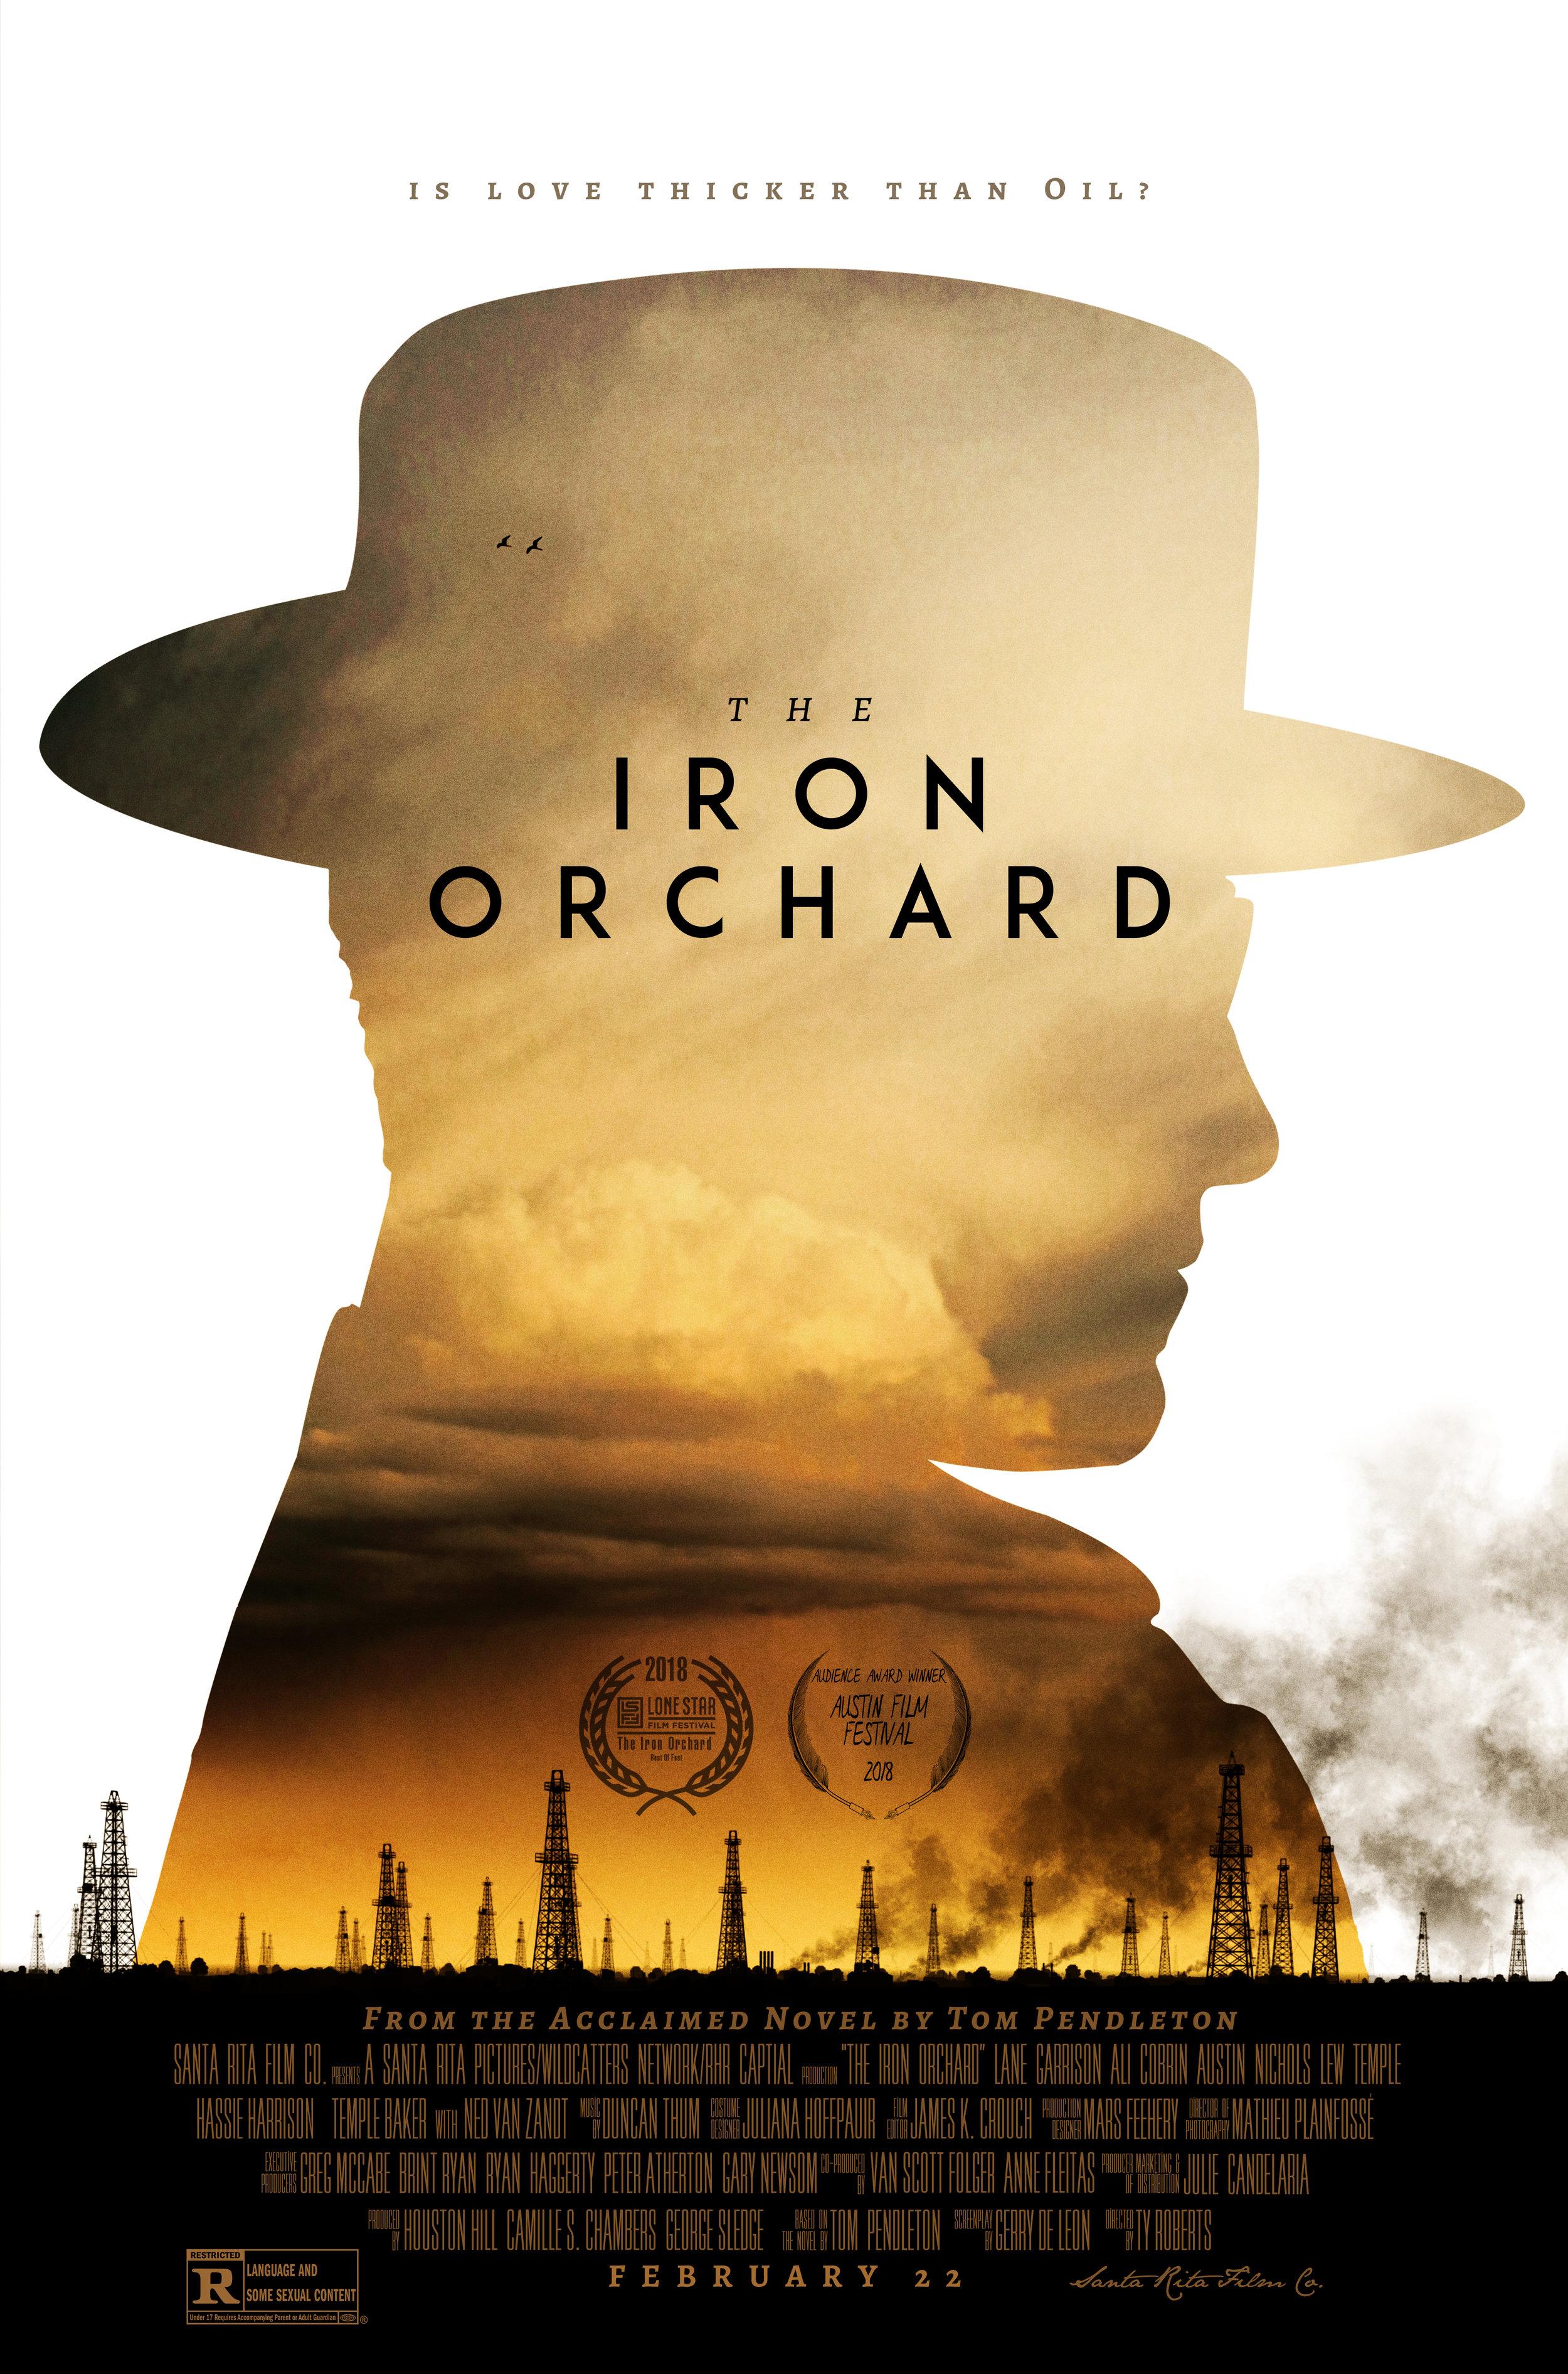 18-1506_Iron_Orchard_FINAL_27x41.jpg